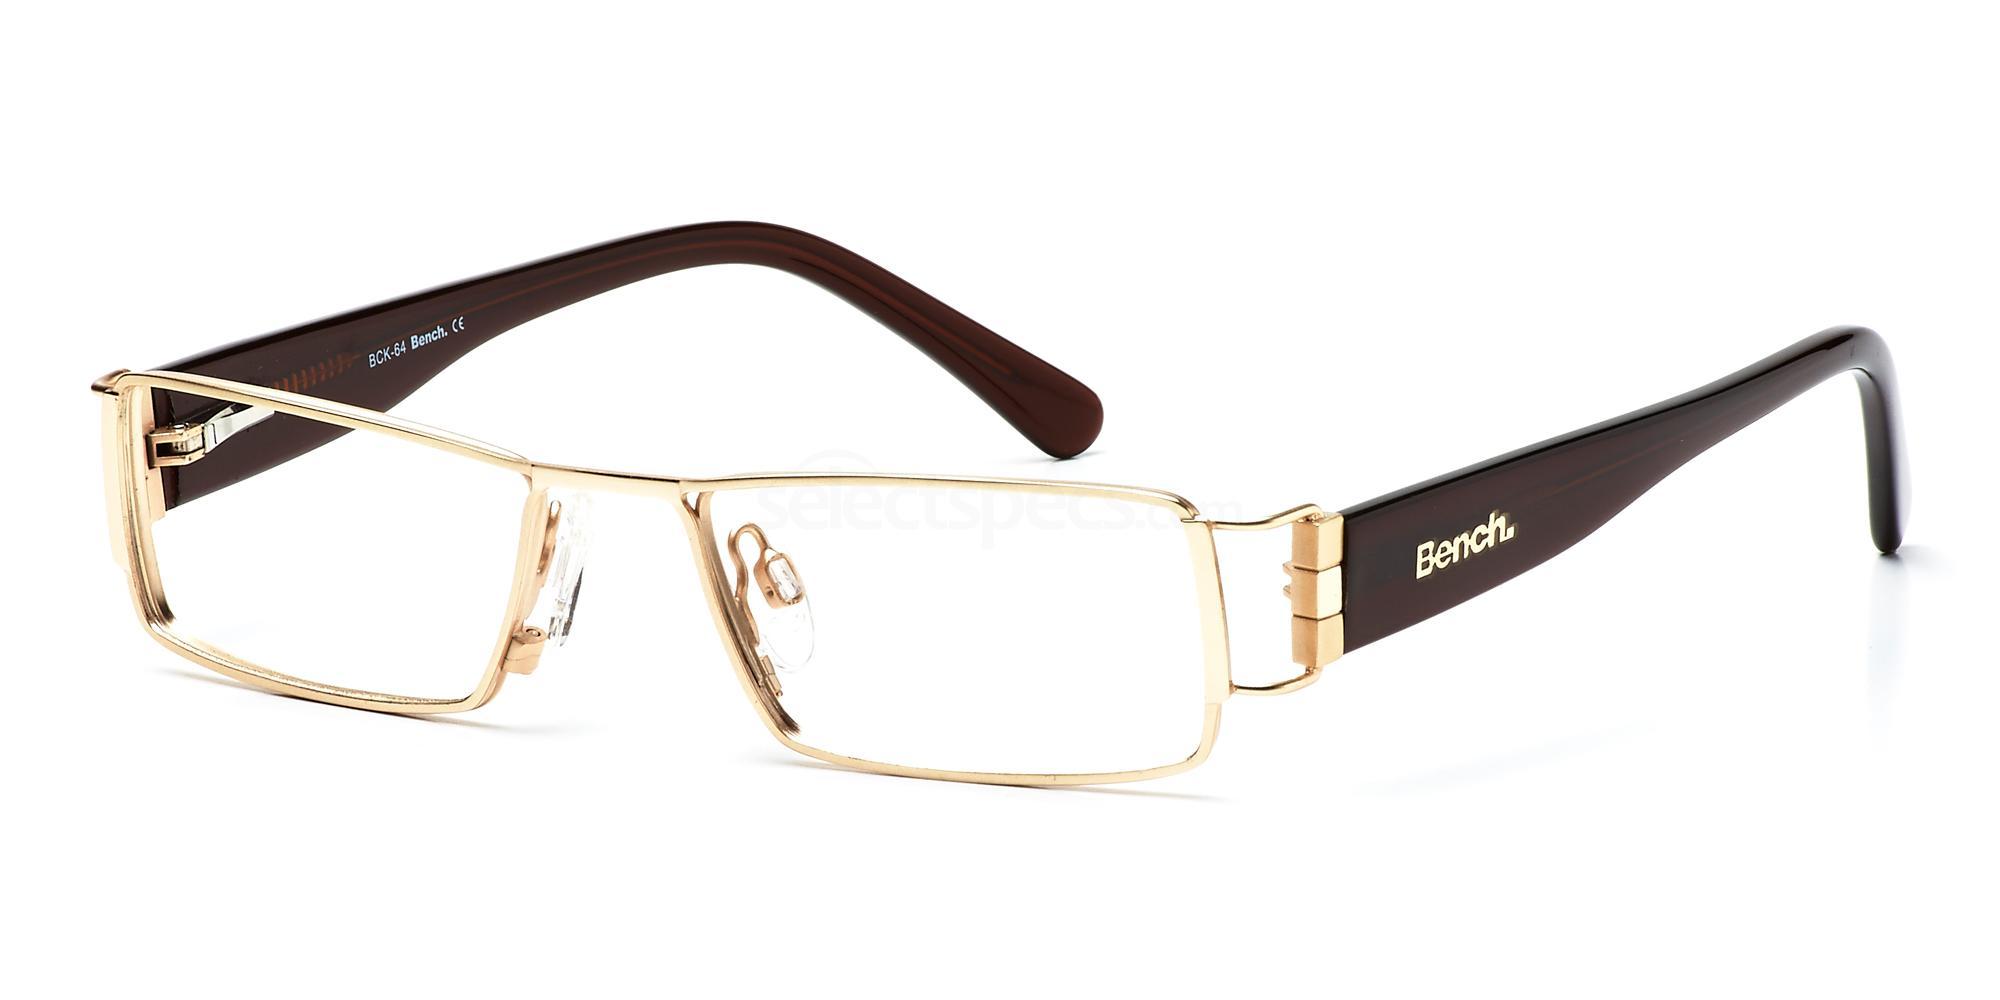 C3 BCK64 Glasses, Bench KIDS